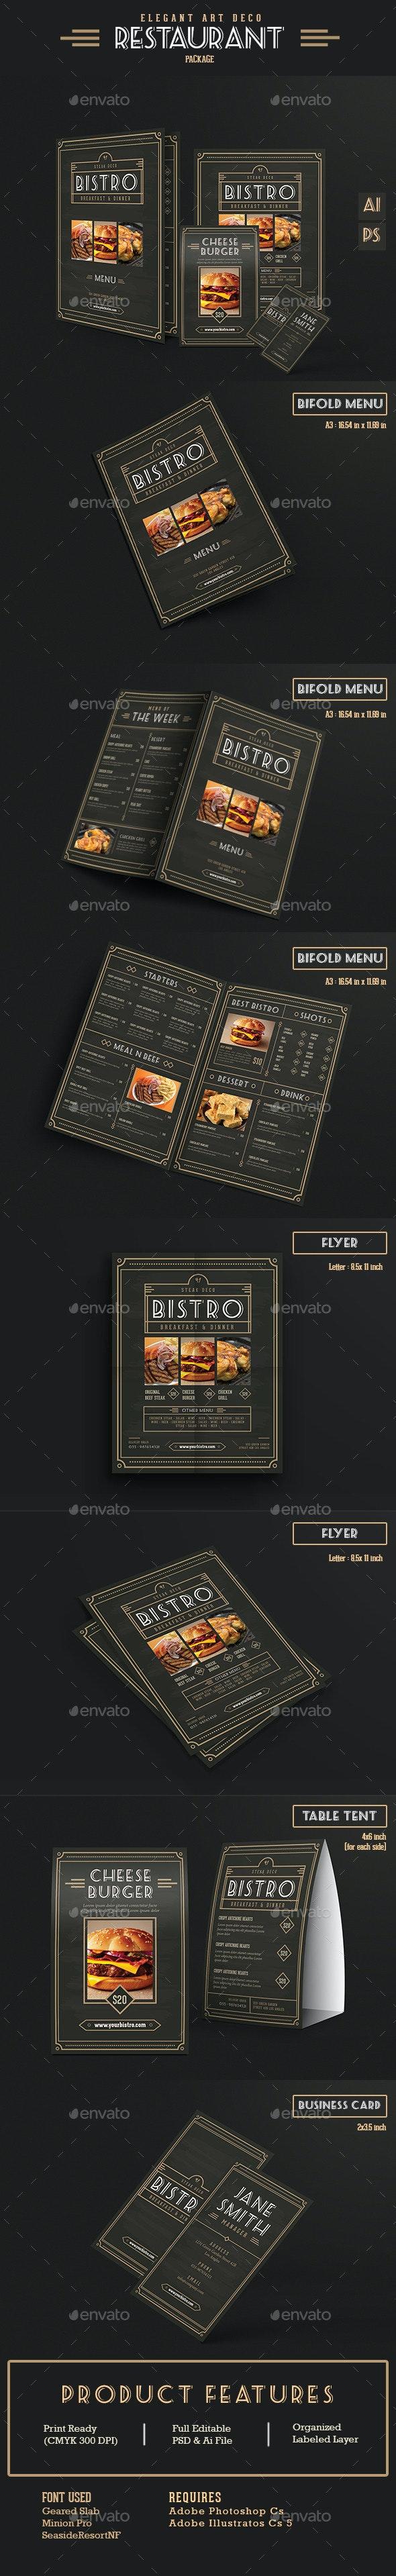 Elegant Restaurant Package - Food Menus Print Templates